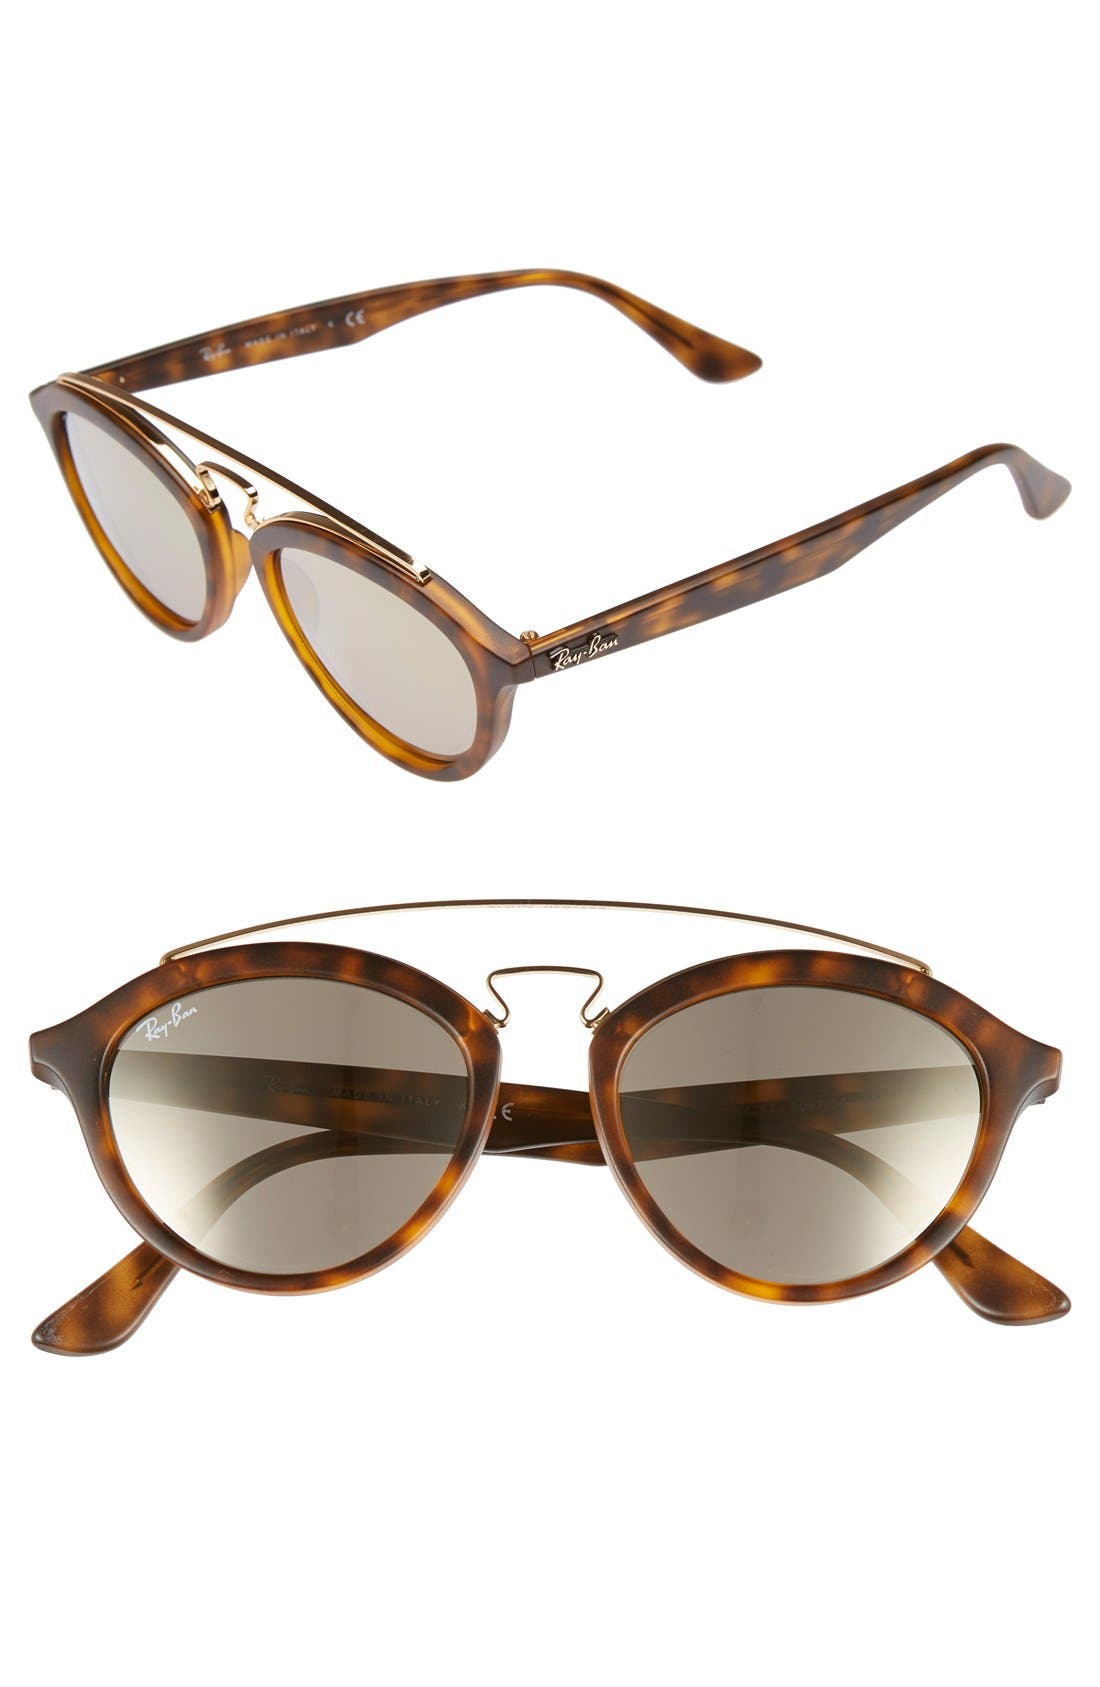 Ray-Ban Highstreet 50mm Brow Bar Sunglasses